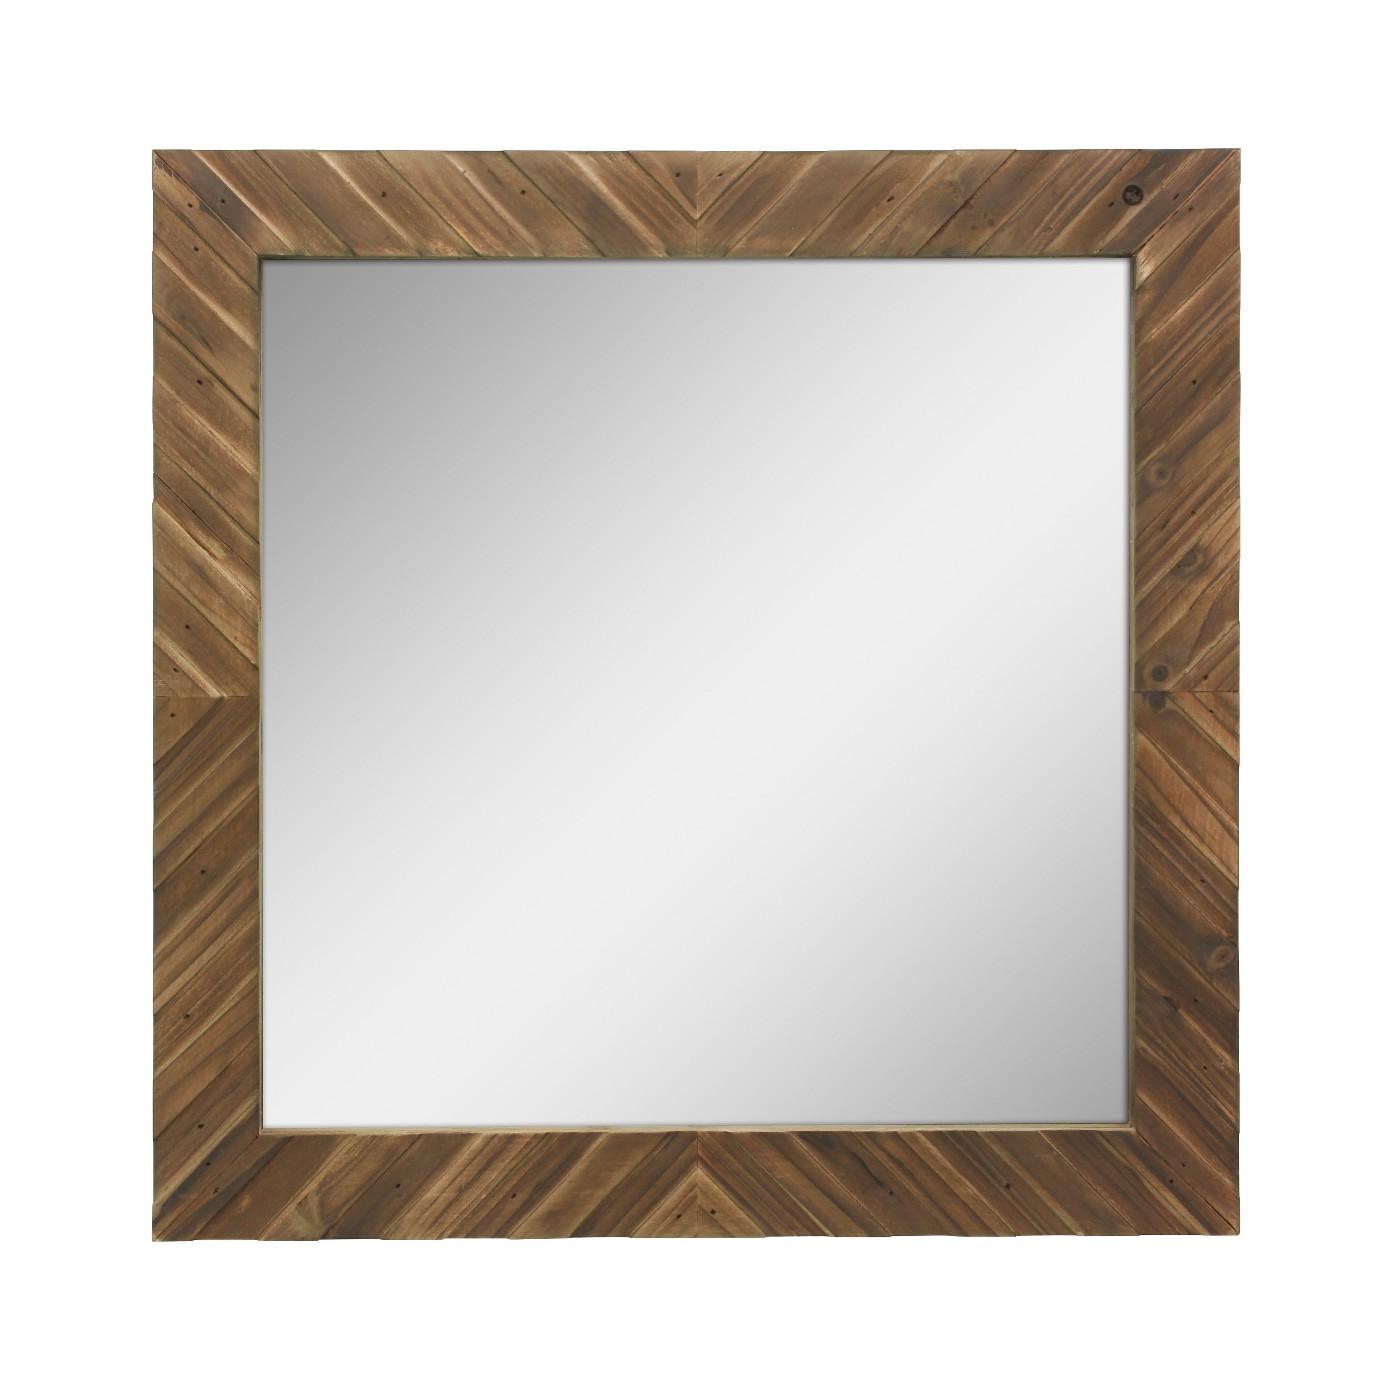 Wood Chevron Mirror - $49.28